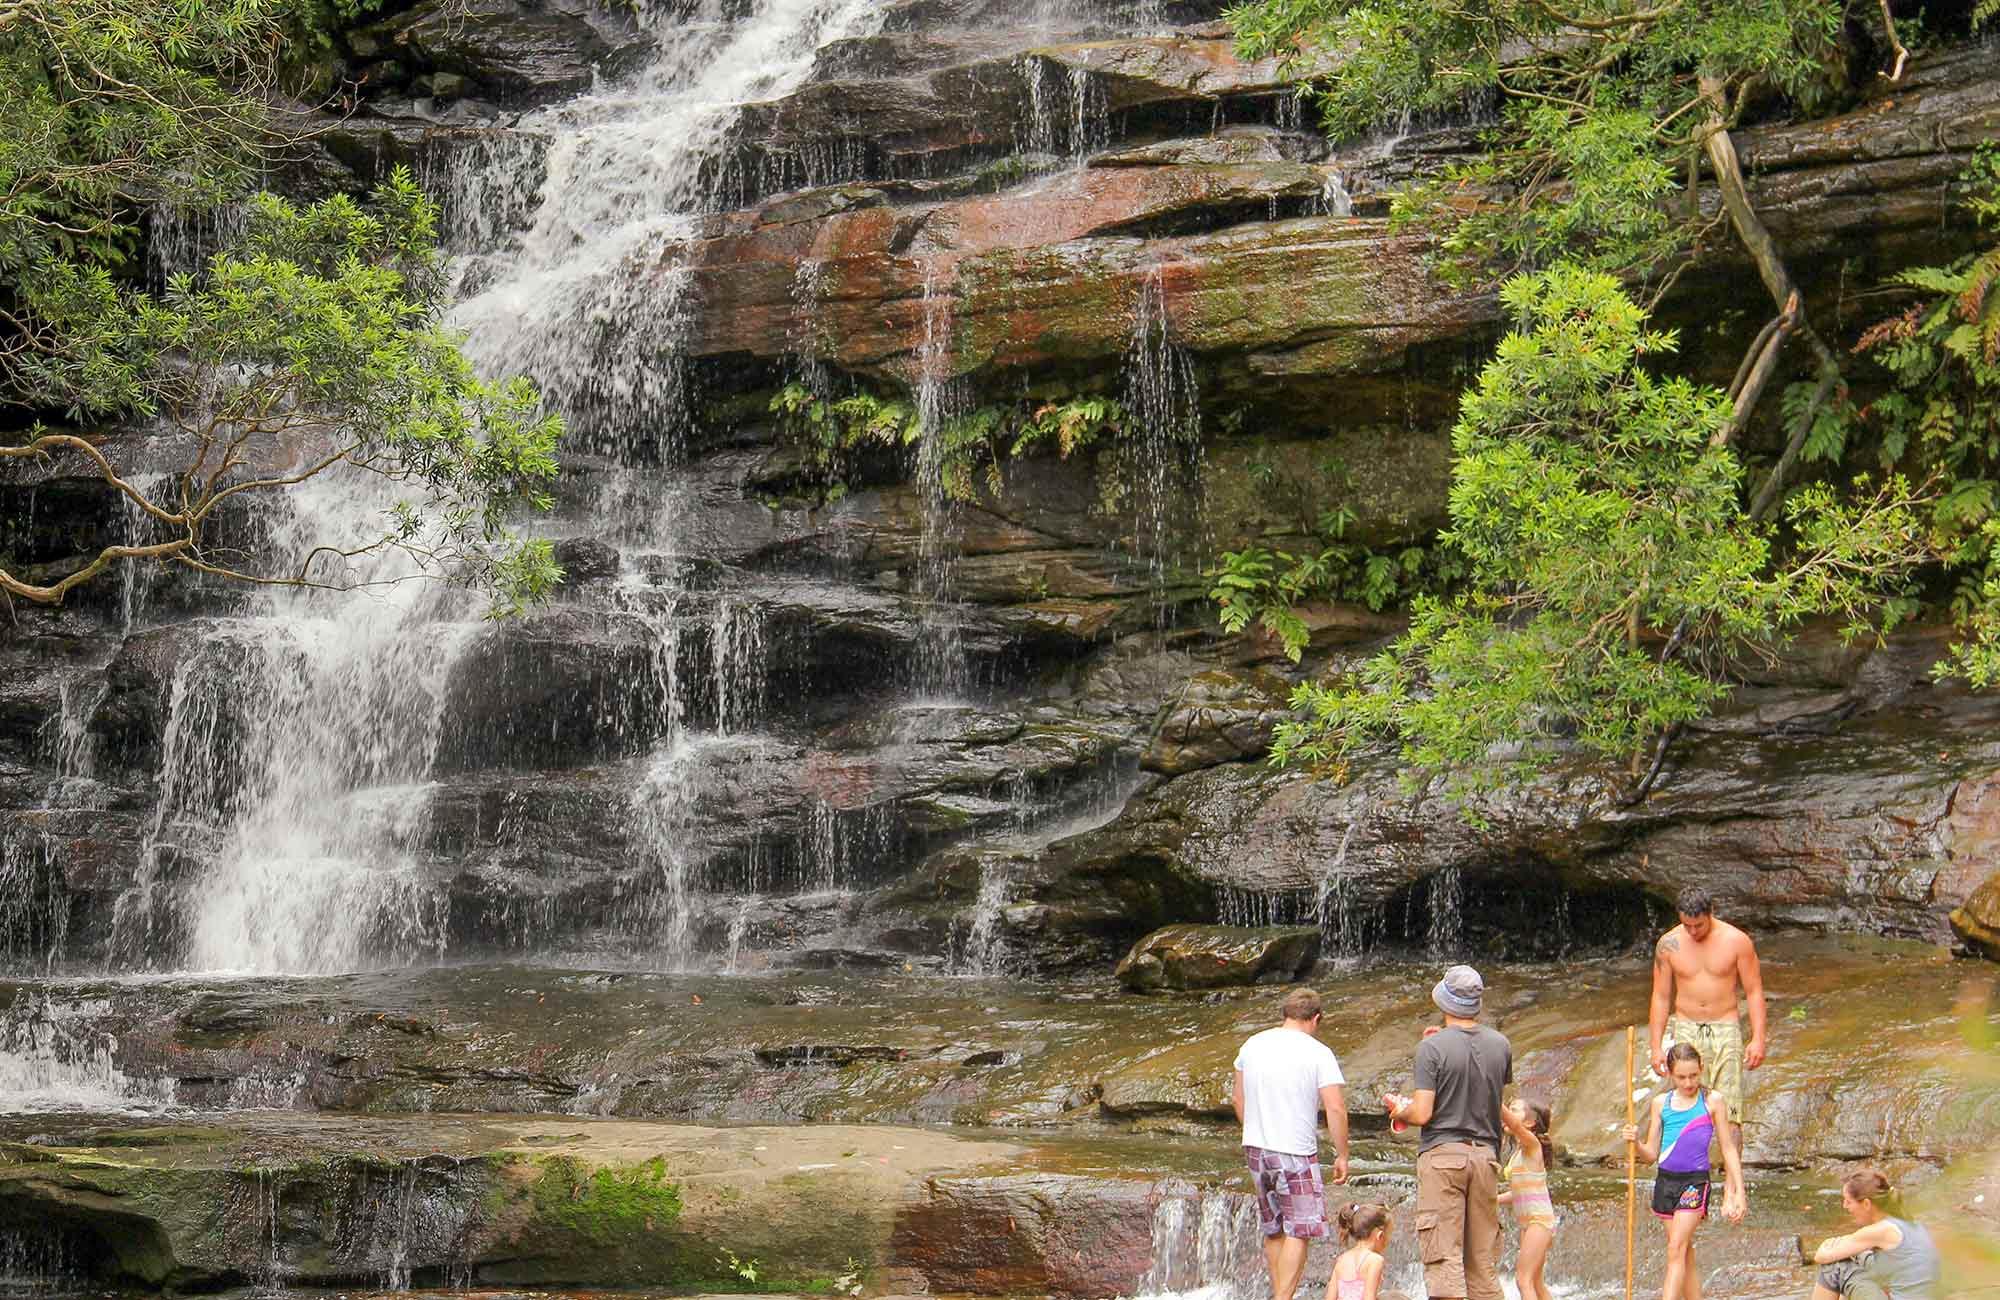 Somersby Falls Picnic Area Brisbane Water National Park Photo John Yurasek